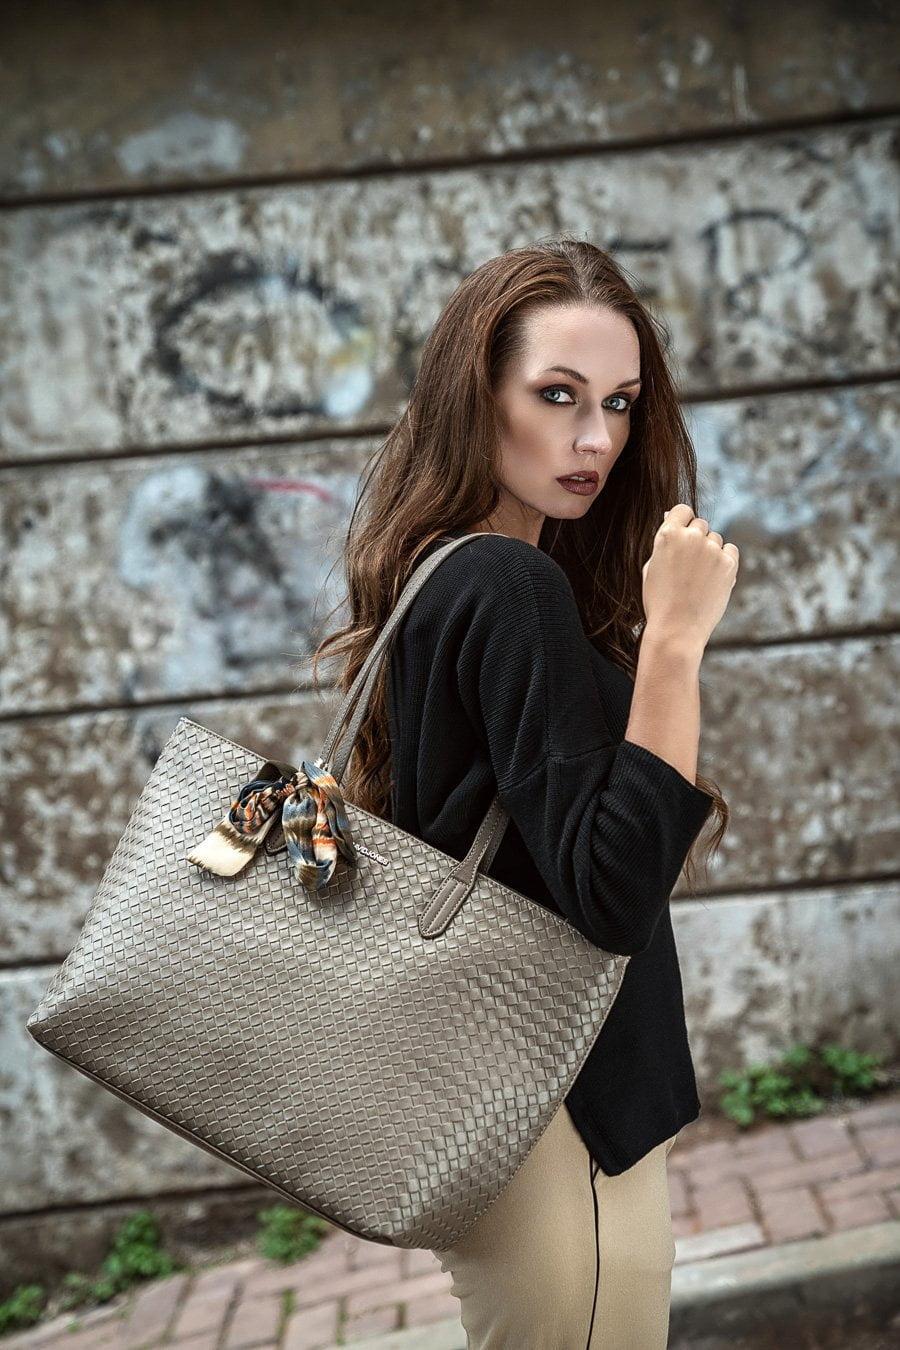 Moda Çekimi - Editorial - Beauty moda tekstil burakbulutfotografatolyesi 27